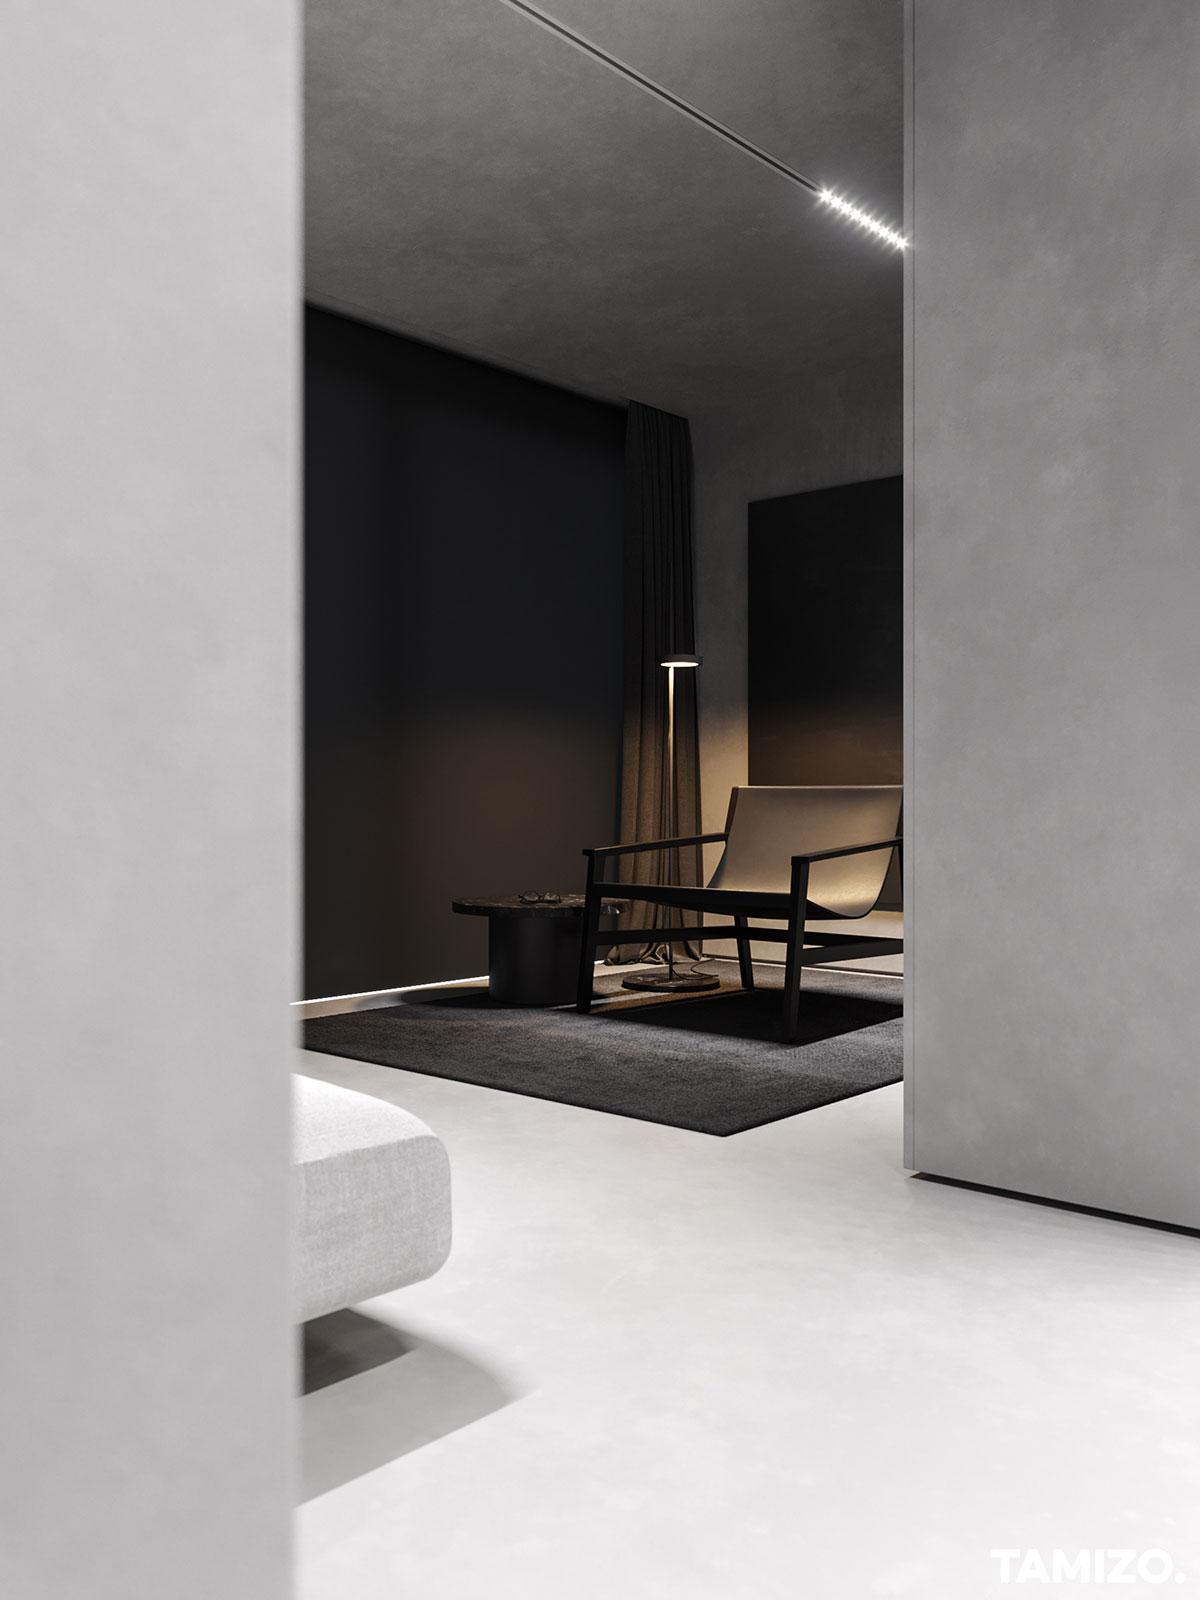 tamizo_architects_mateusz_kuo_stolarski_nice_nicea_france_iterior_design_apartment_17